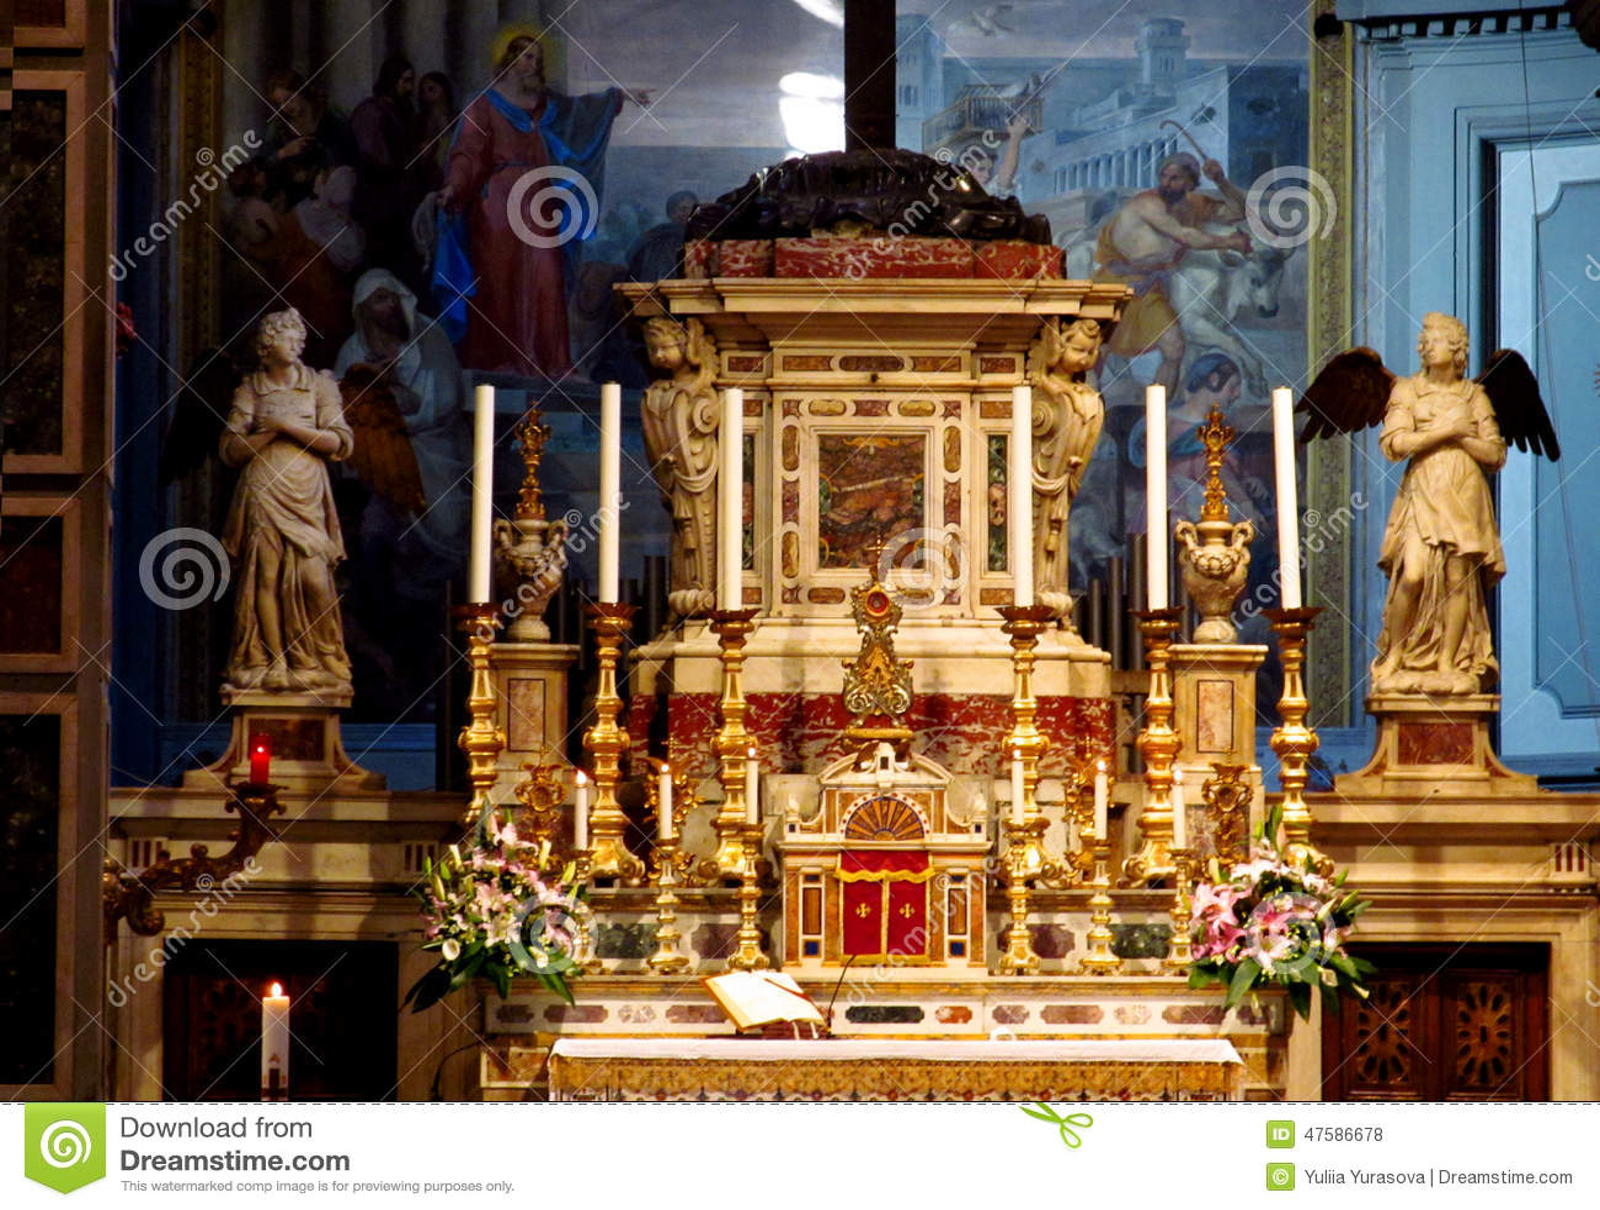 Florence Cathedral Basilica di Santa Maria del Fiore dentro del altar del santuario